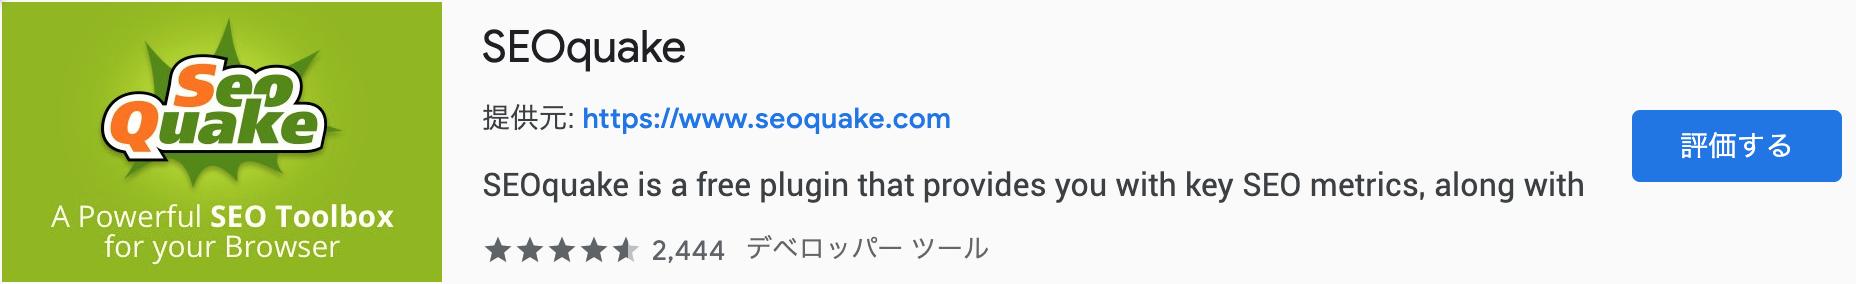 SEOquake 拡張機能